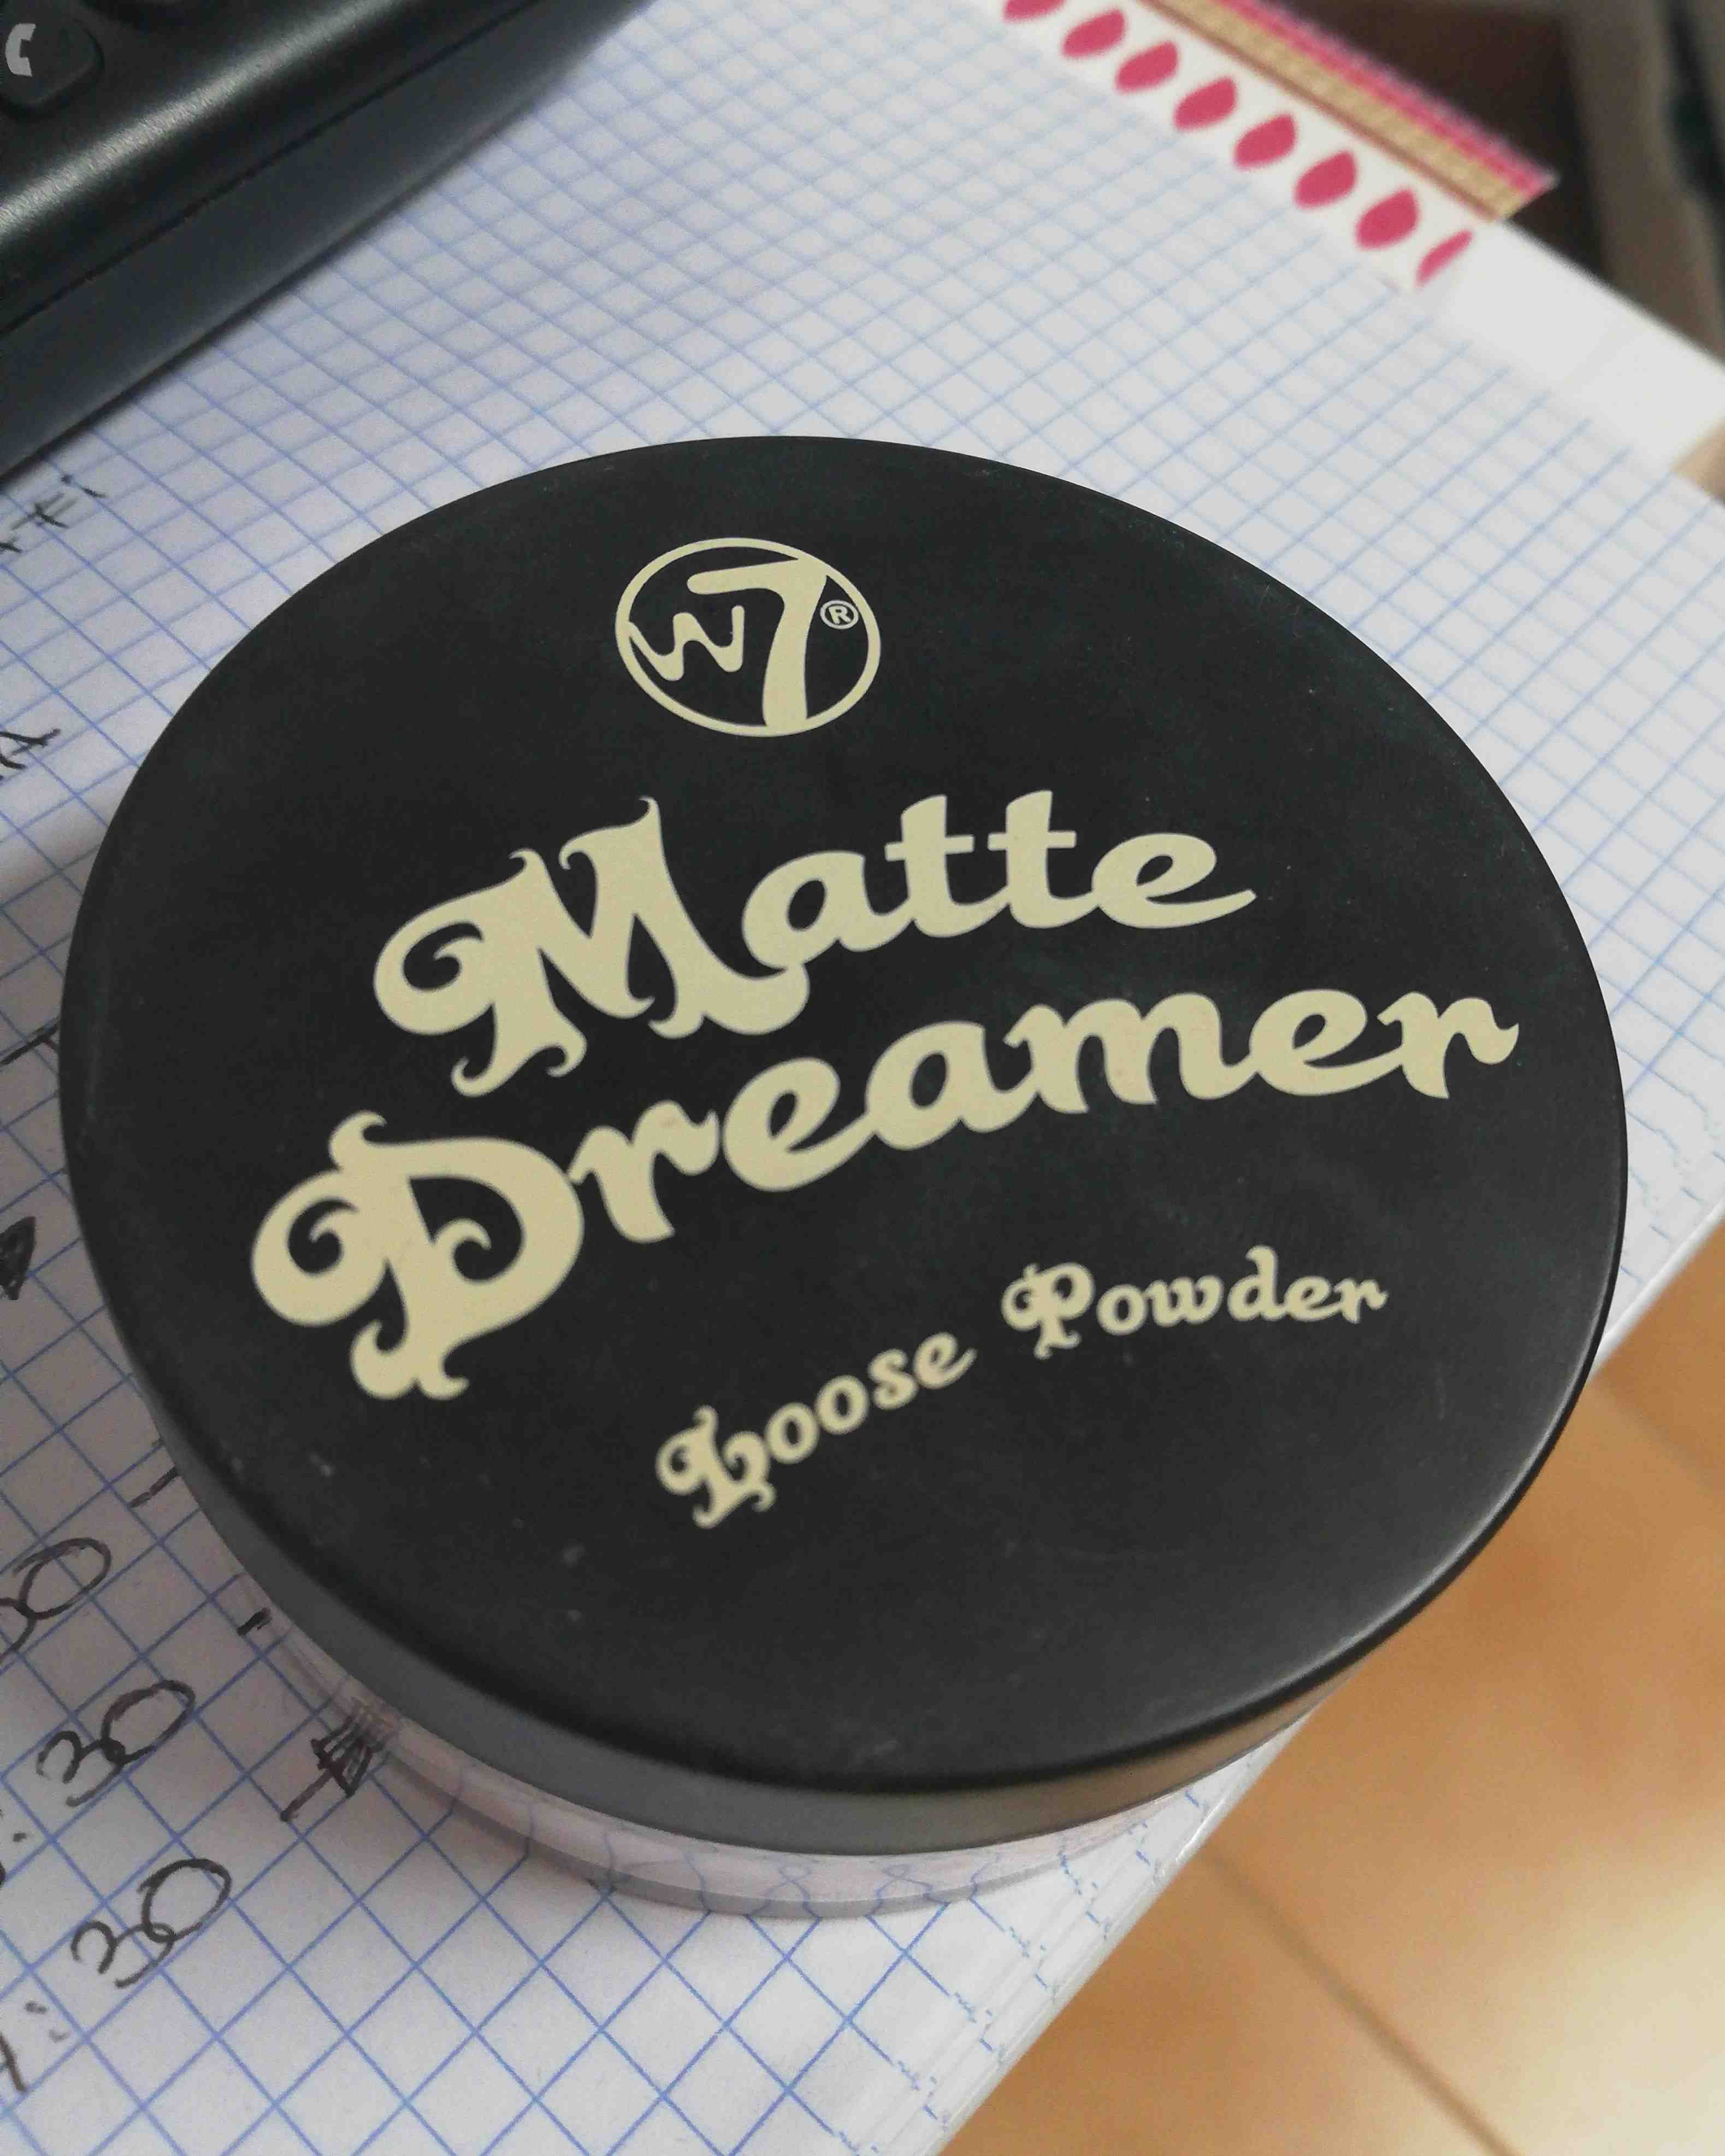 Matte dreamer - Product